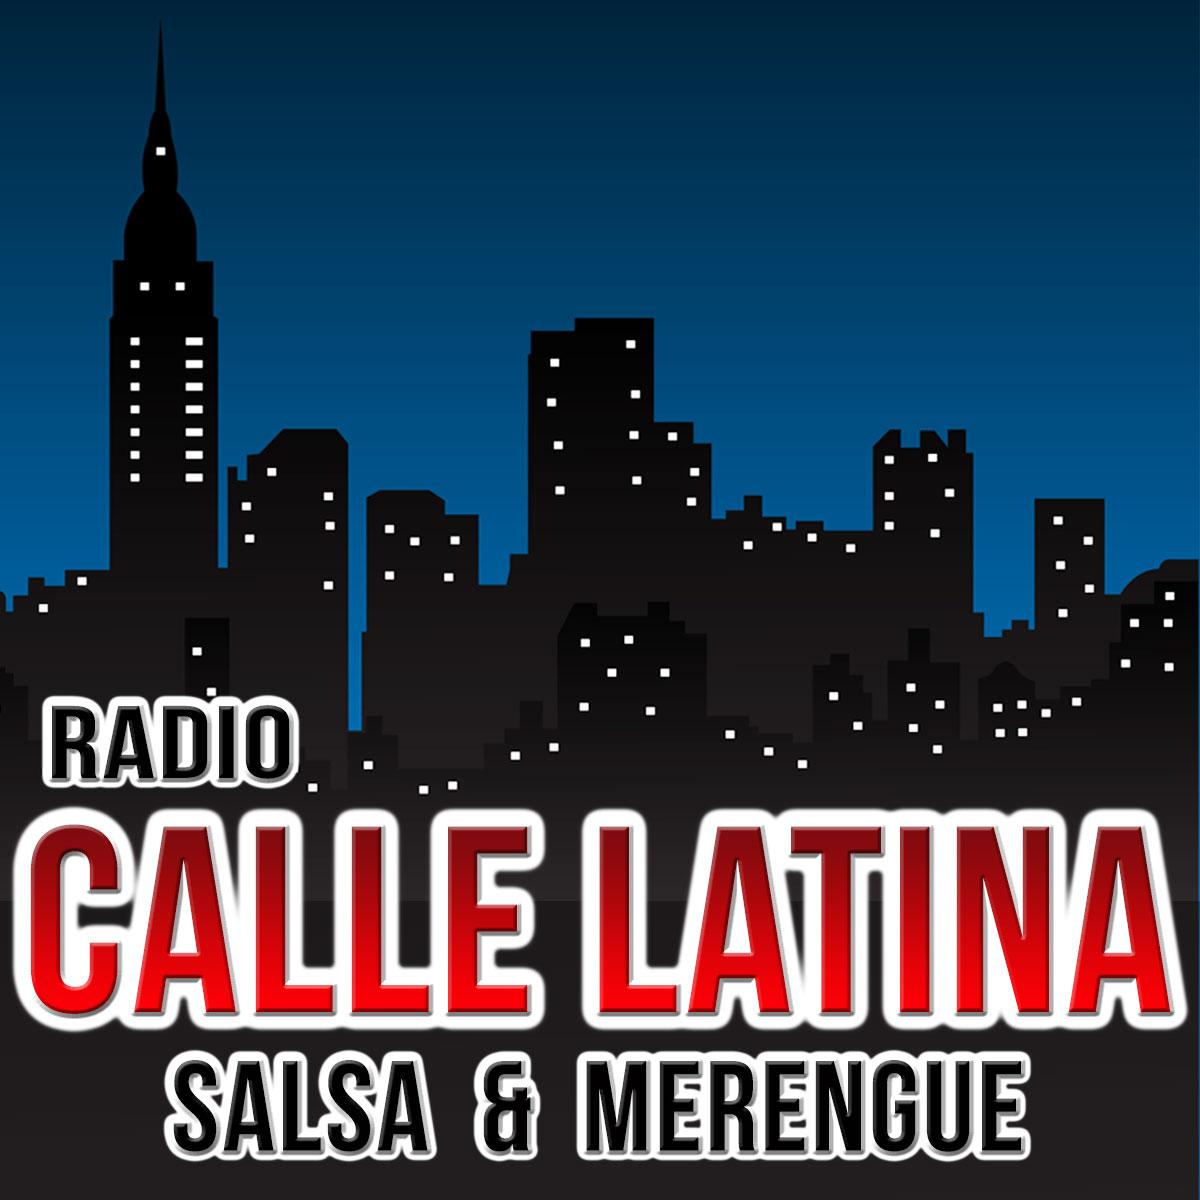 Live Latin Radio Stations 19